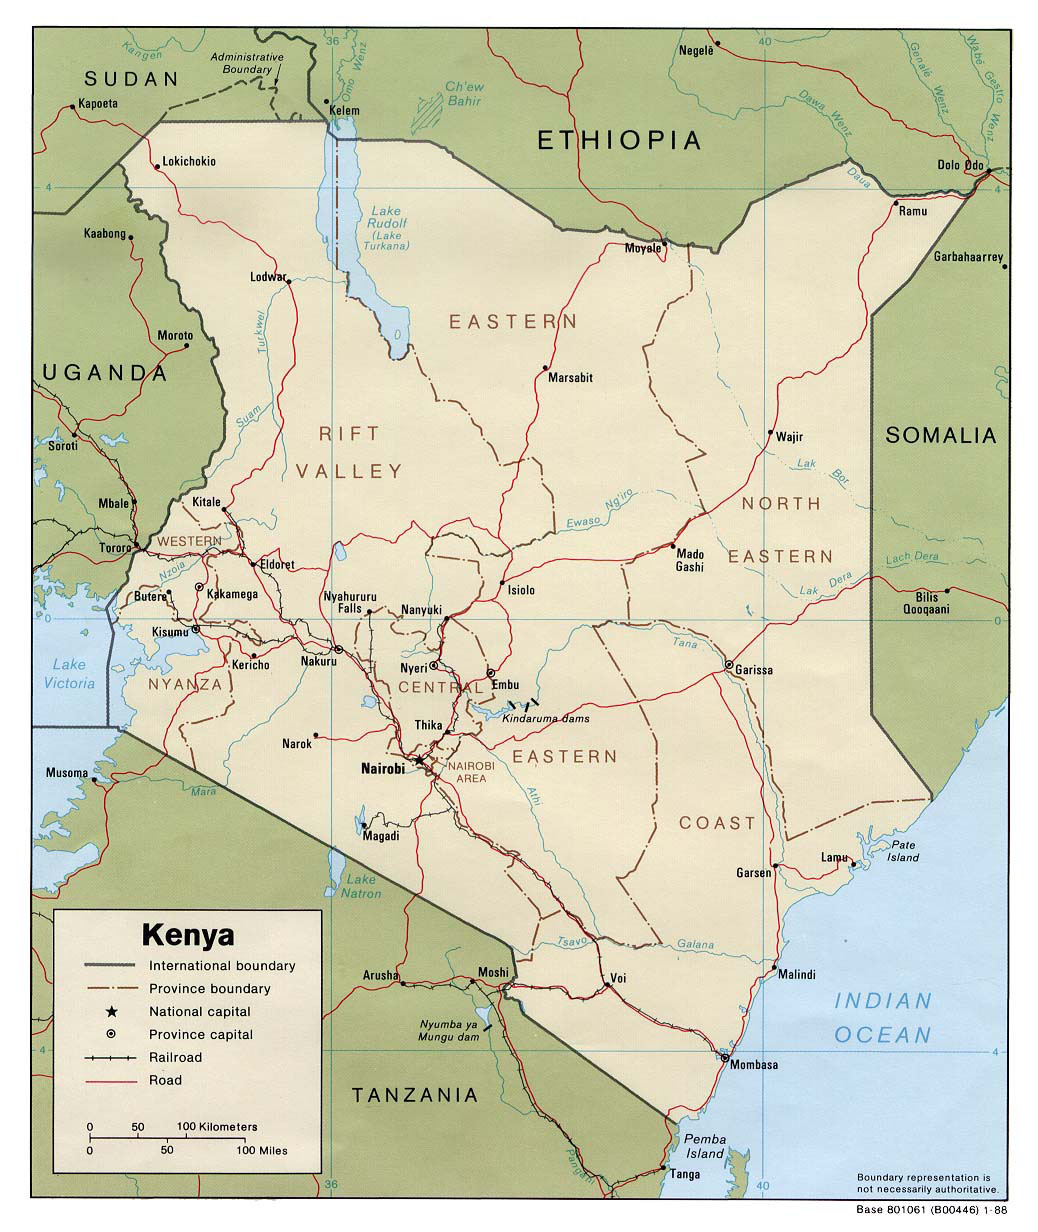 Detailed political and administrative map of Kenya. Kenya detailed on kenya counties list, kenya thematic map, kenya animals, kenya flag, kenya points of interest, limuru kenya map, kenya route map, kenya vegetation map, kenya tourist map, kenya africa map, kenya topographical map, kenya police map, kenya travel map, kenya map regions, kenya equator, kenya map detailed, kenya coast map, kenya country map, kenya town map,